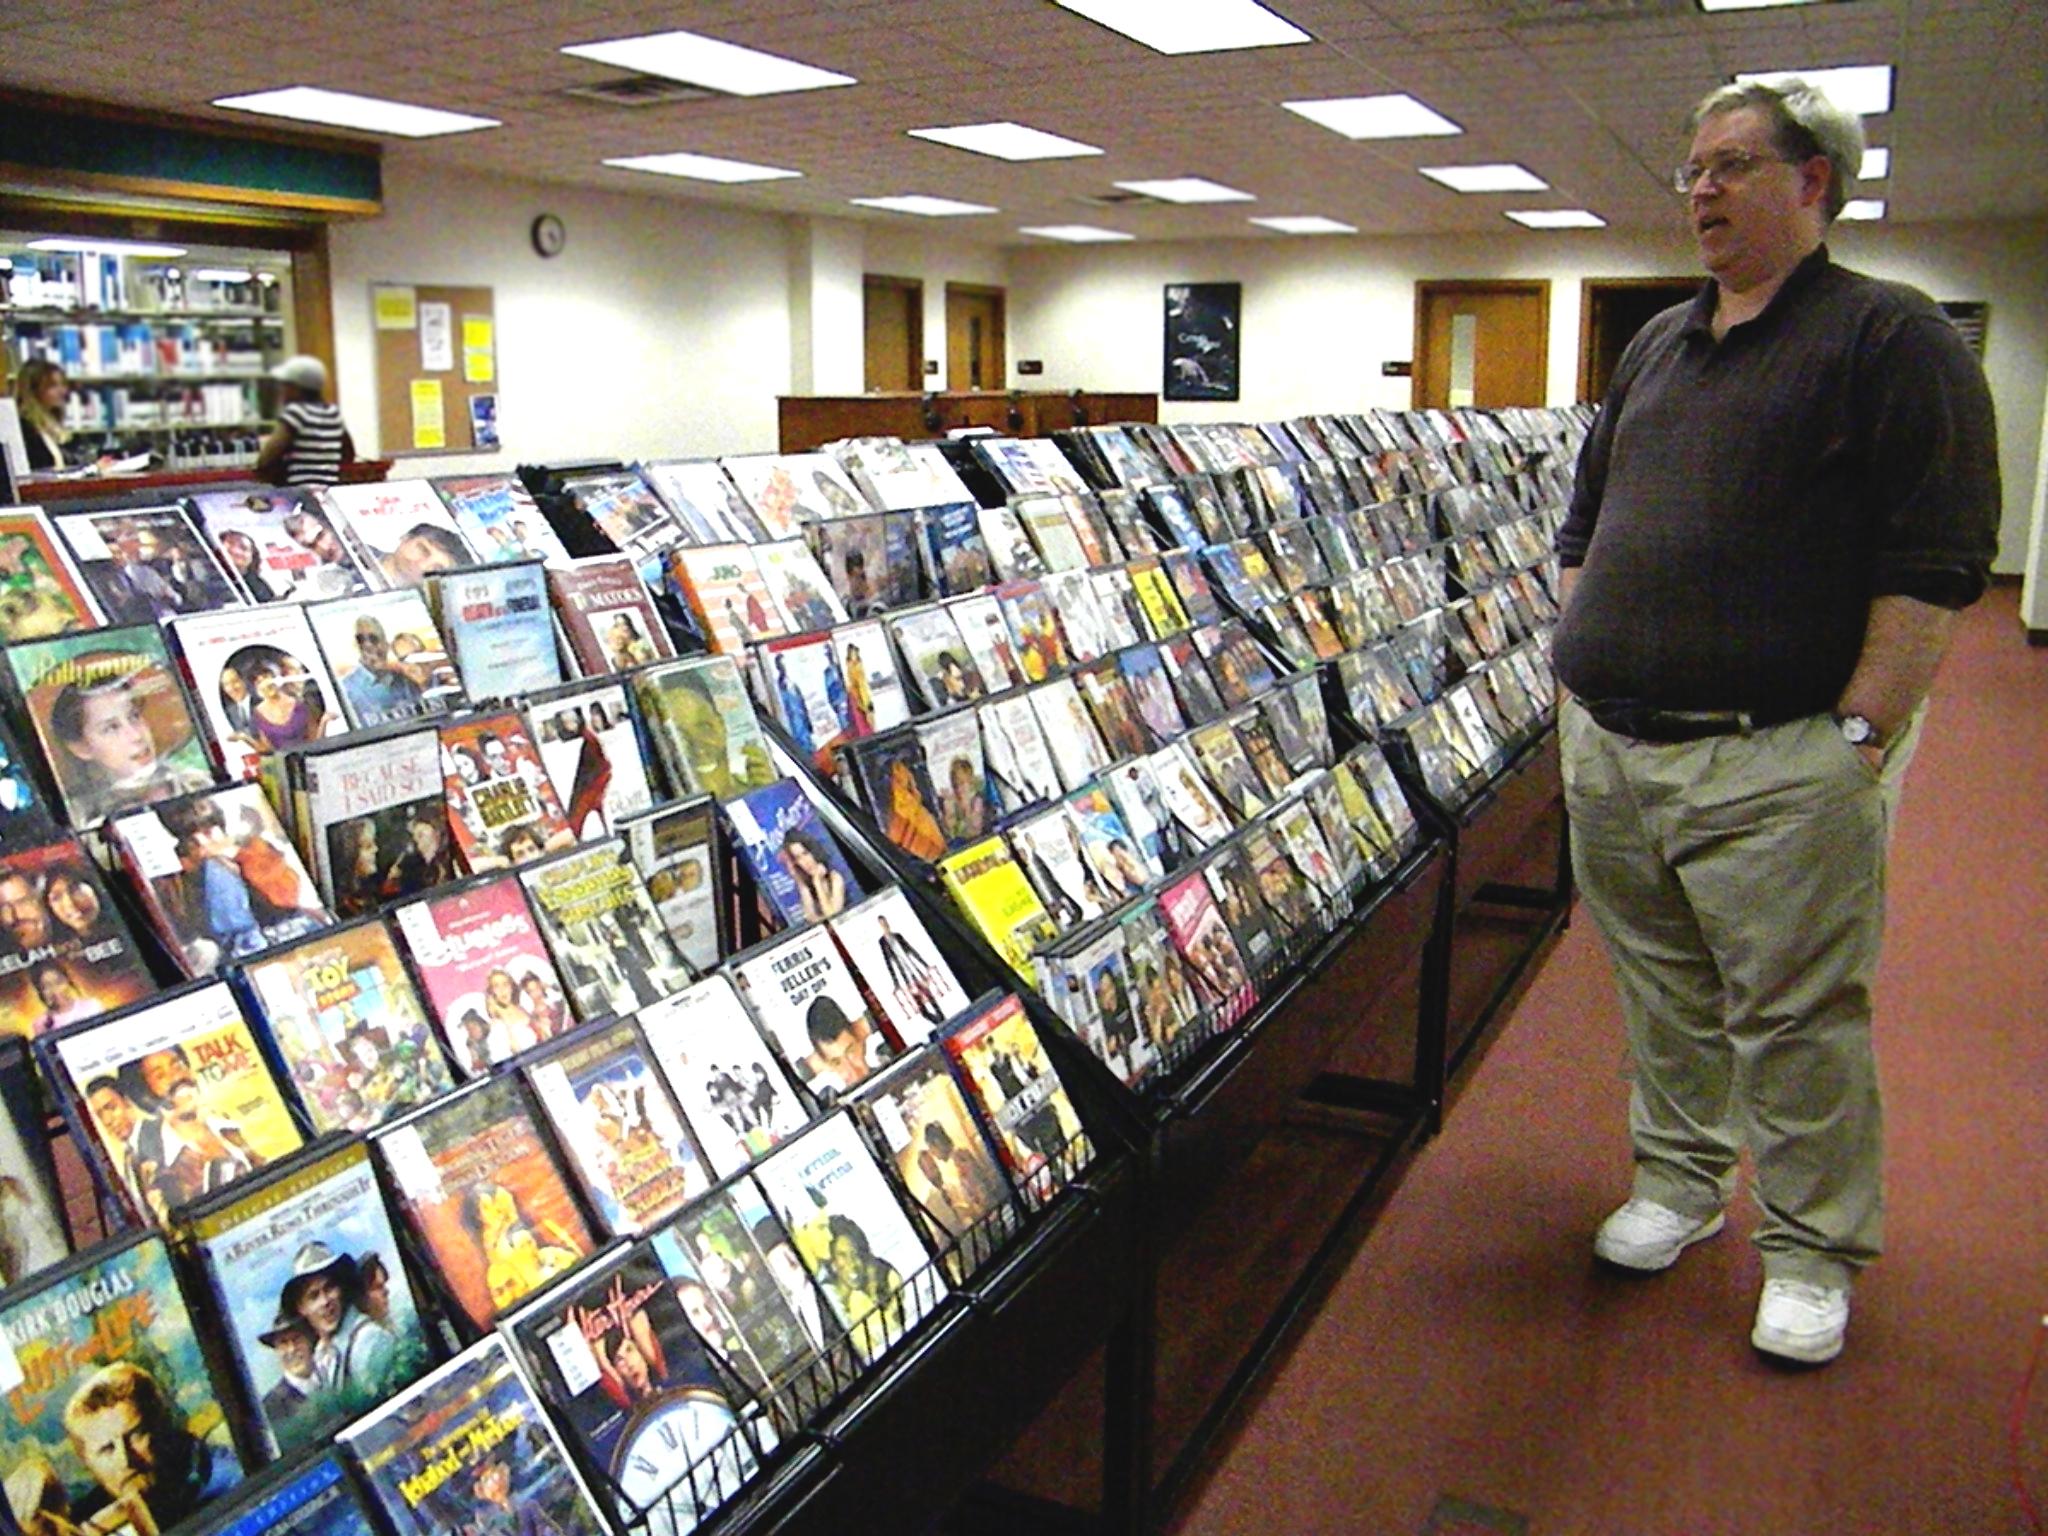 $30 million planned for Moffett Library remodel